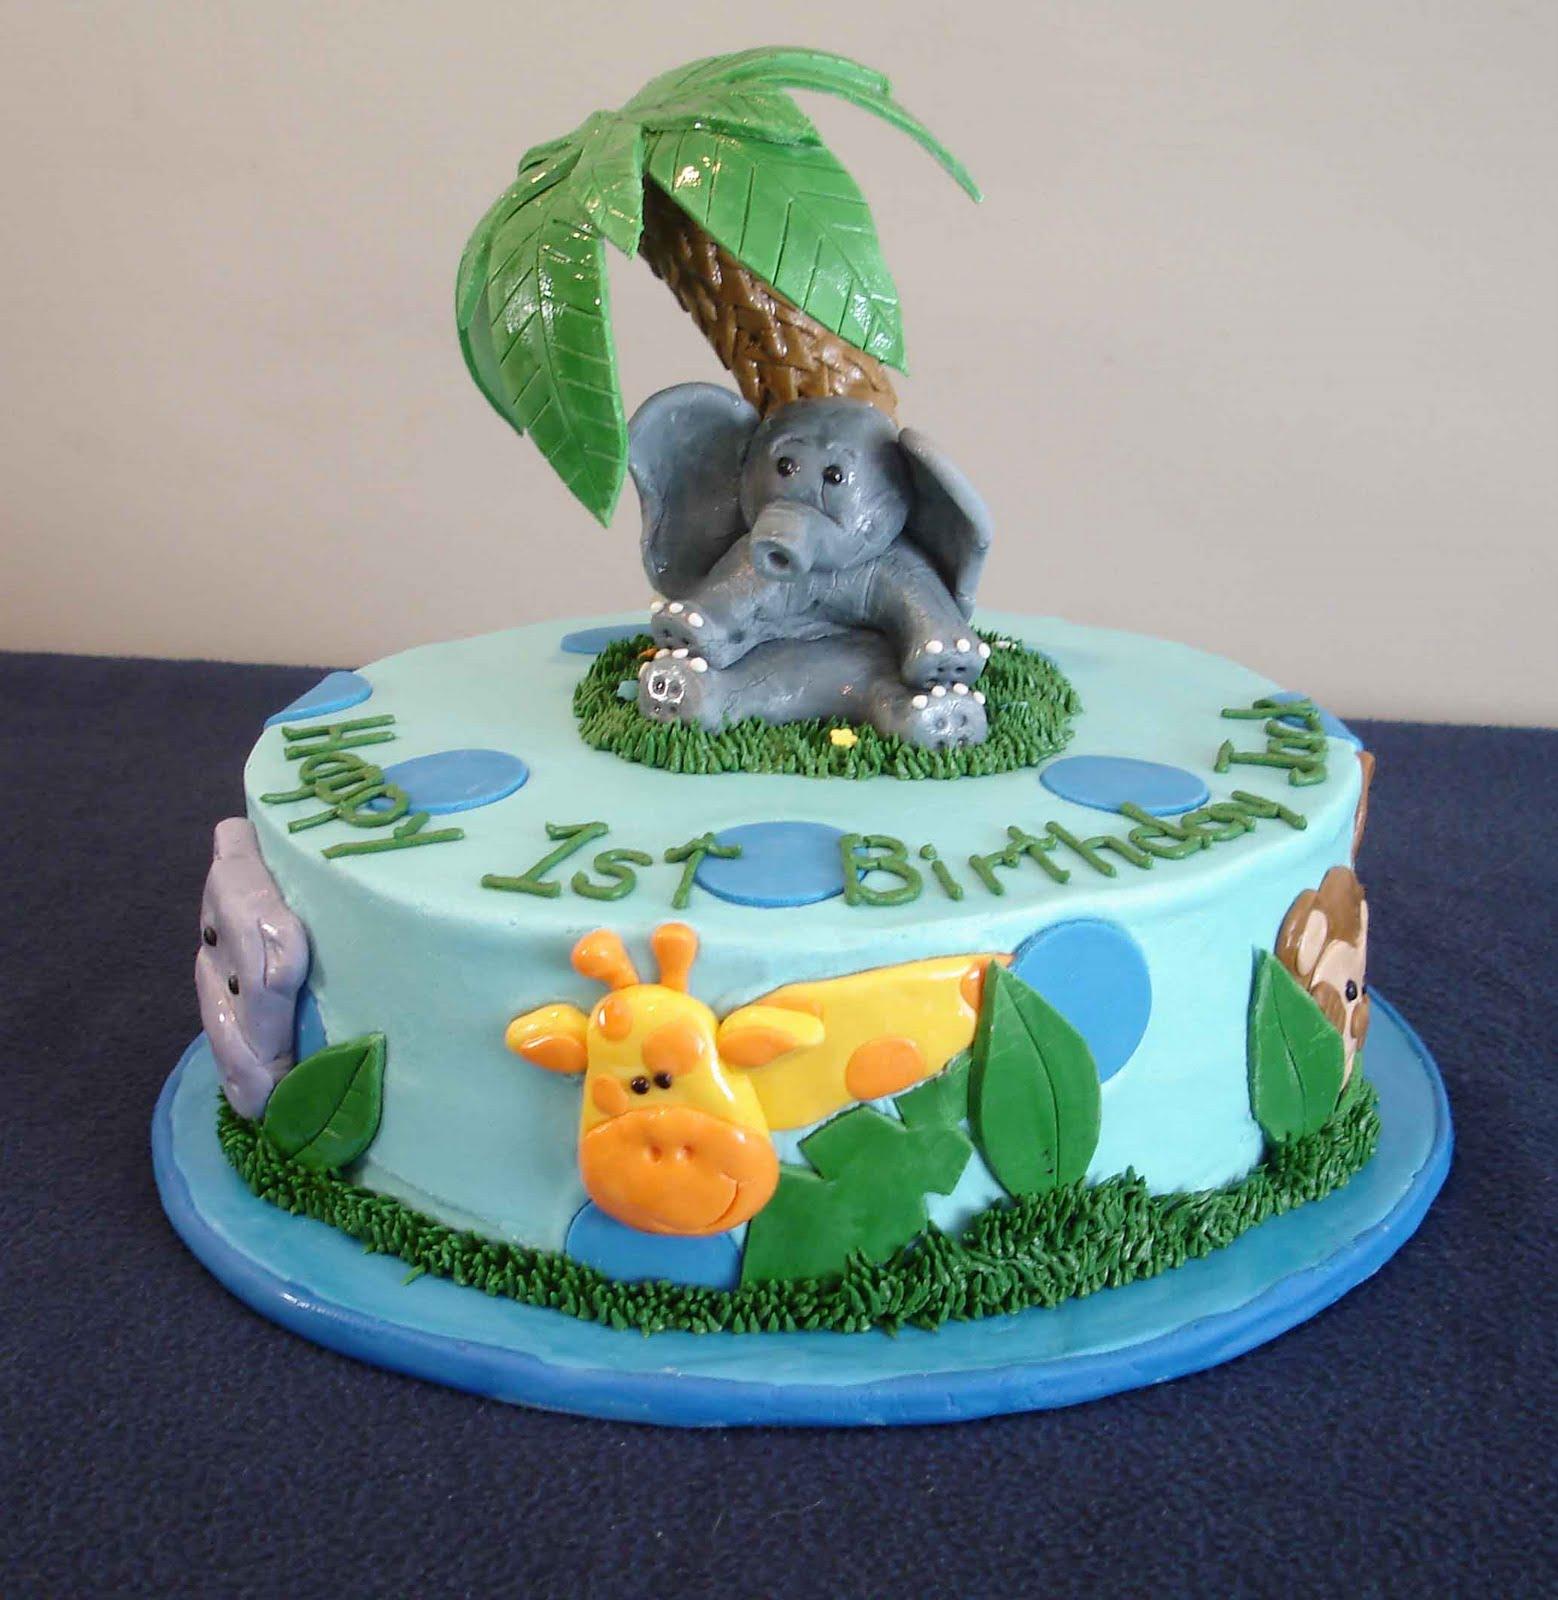 Cake Designs Jungle : Serendipity Cake Design: Jungle Cake